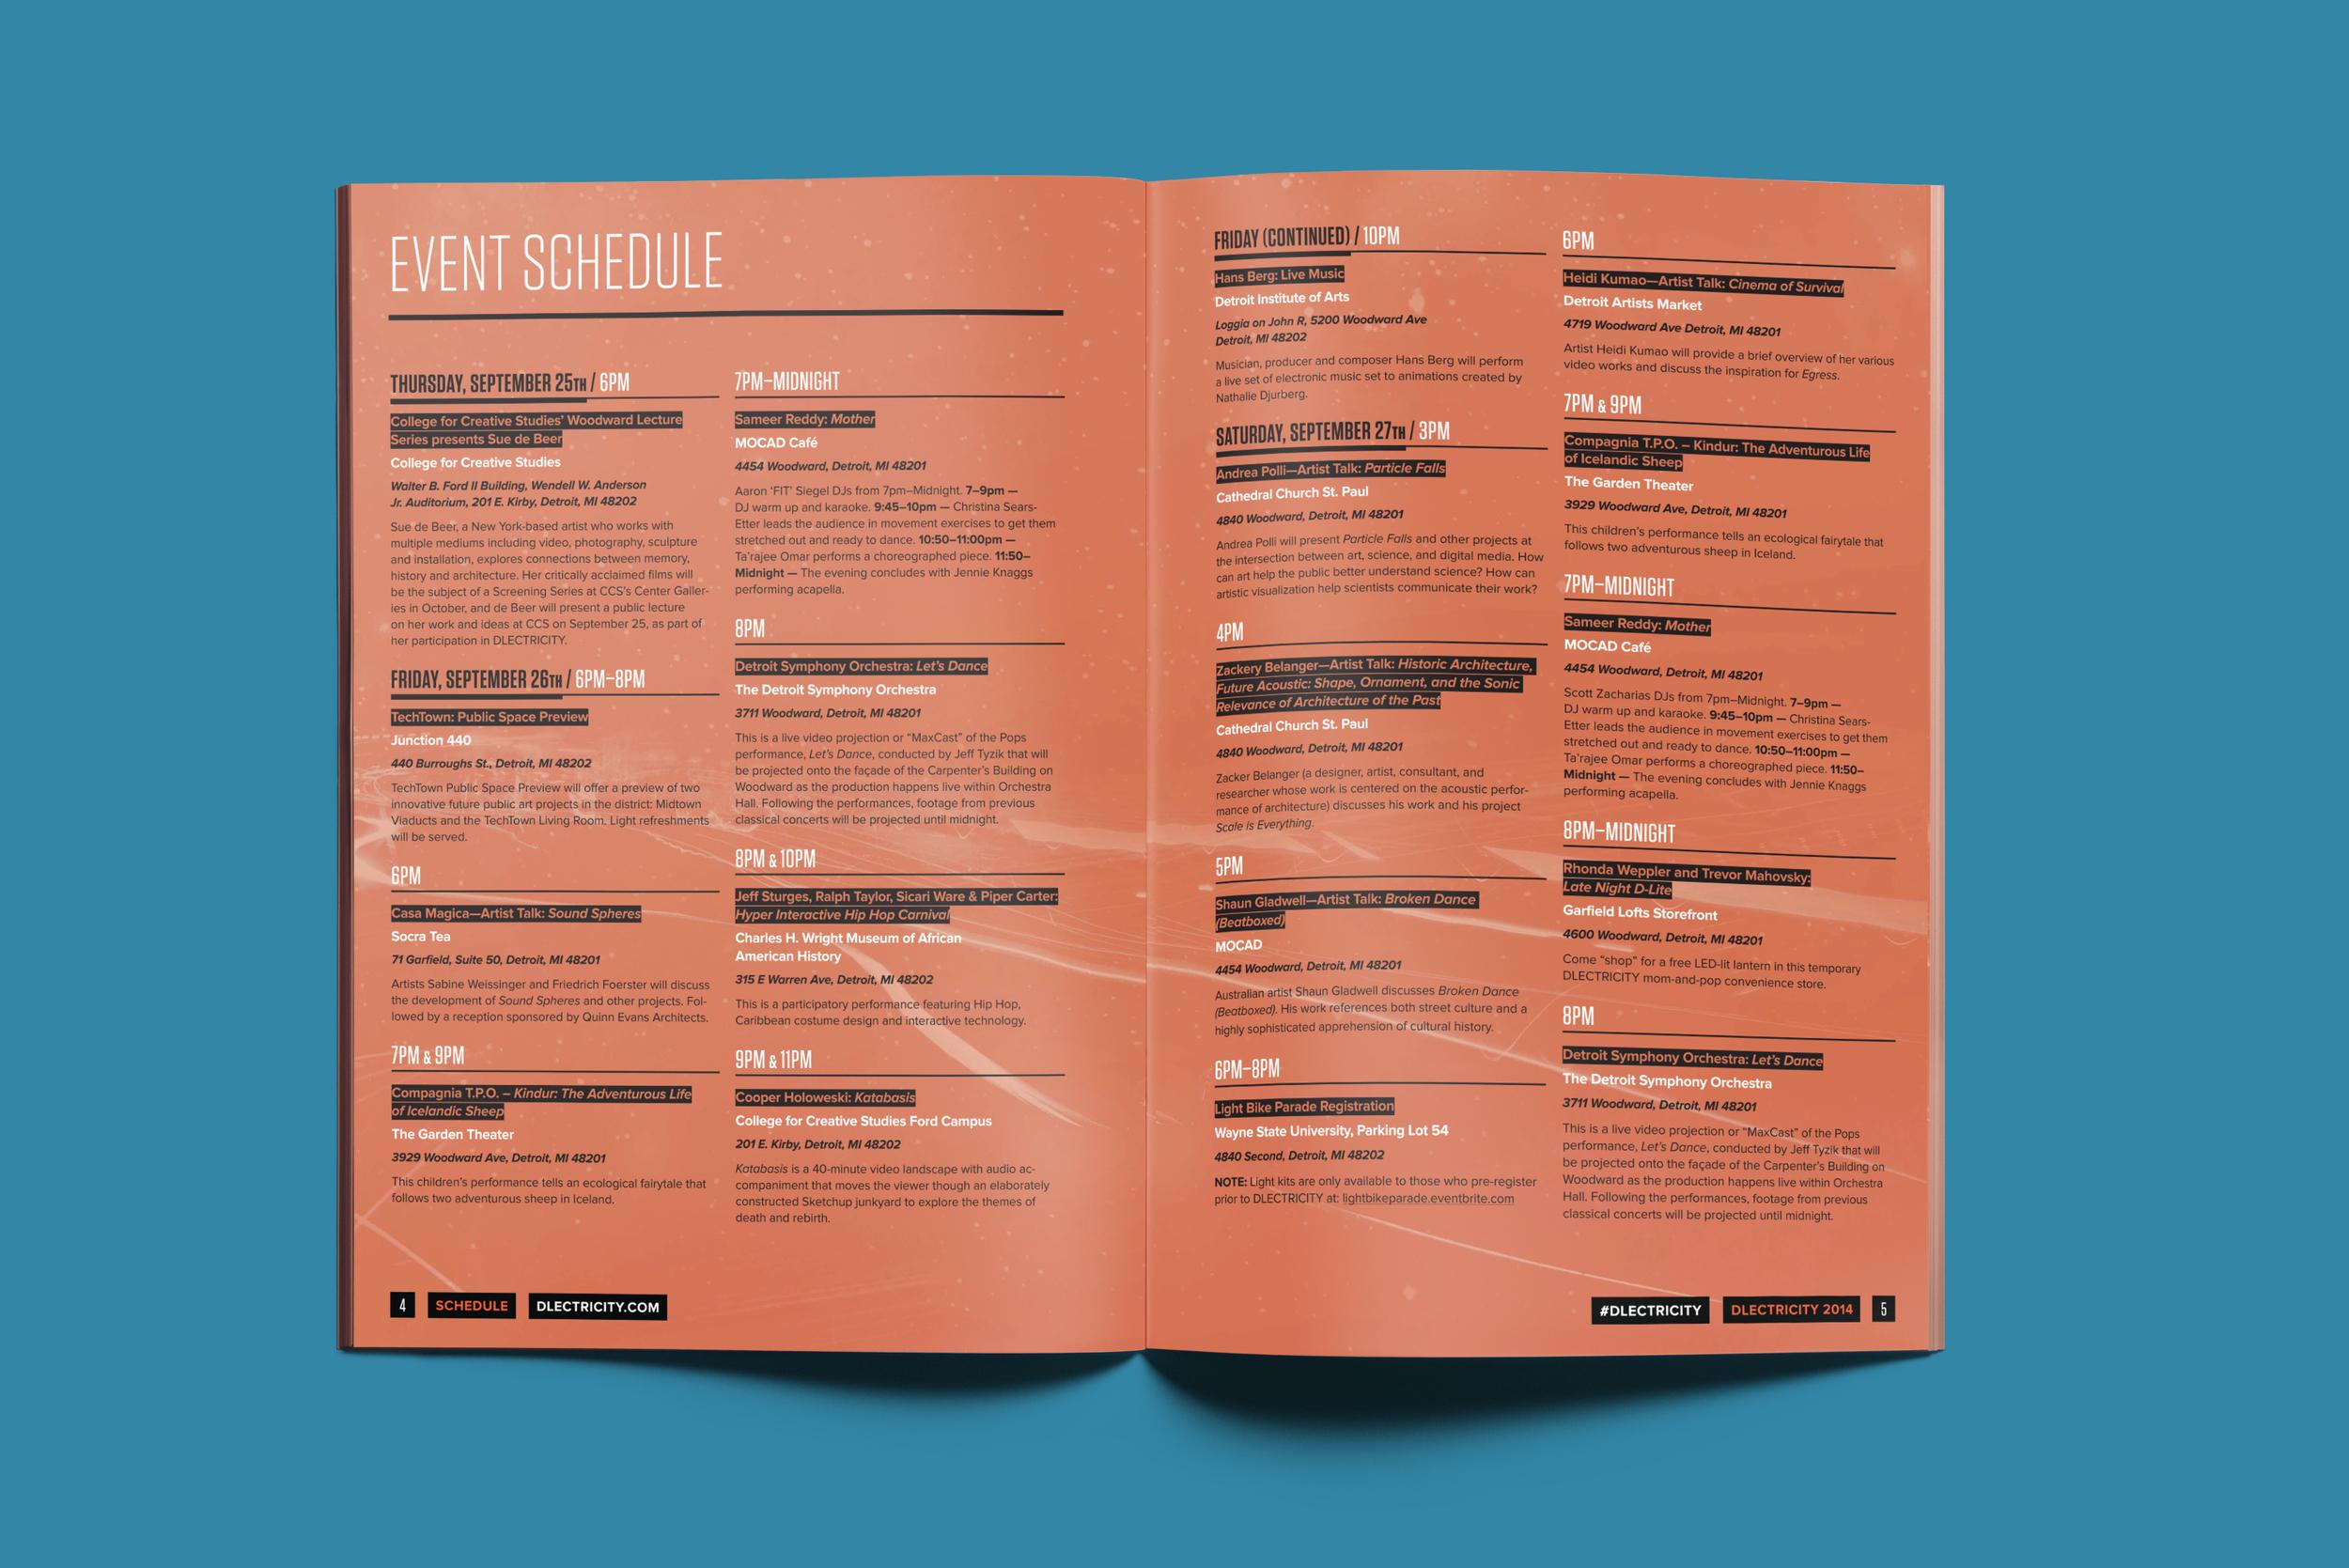 Program_Guide_Interior.jpg